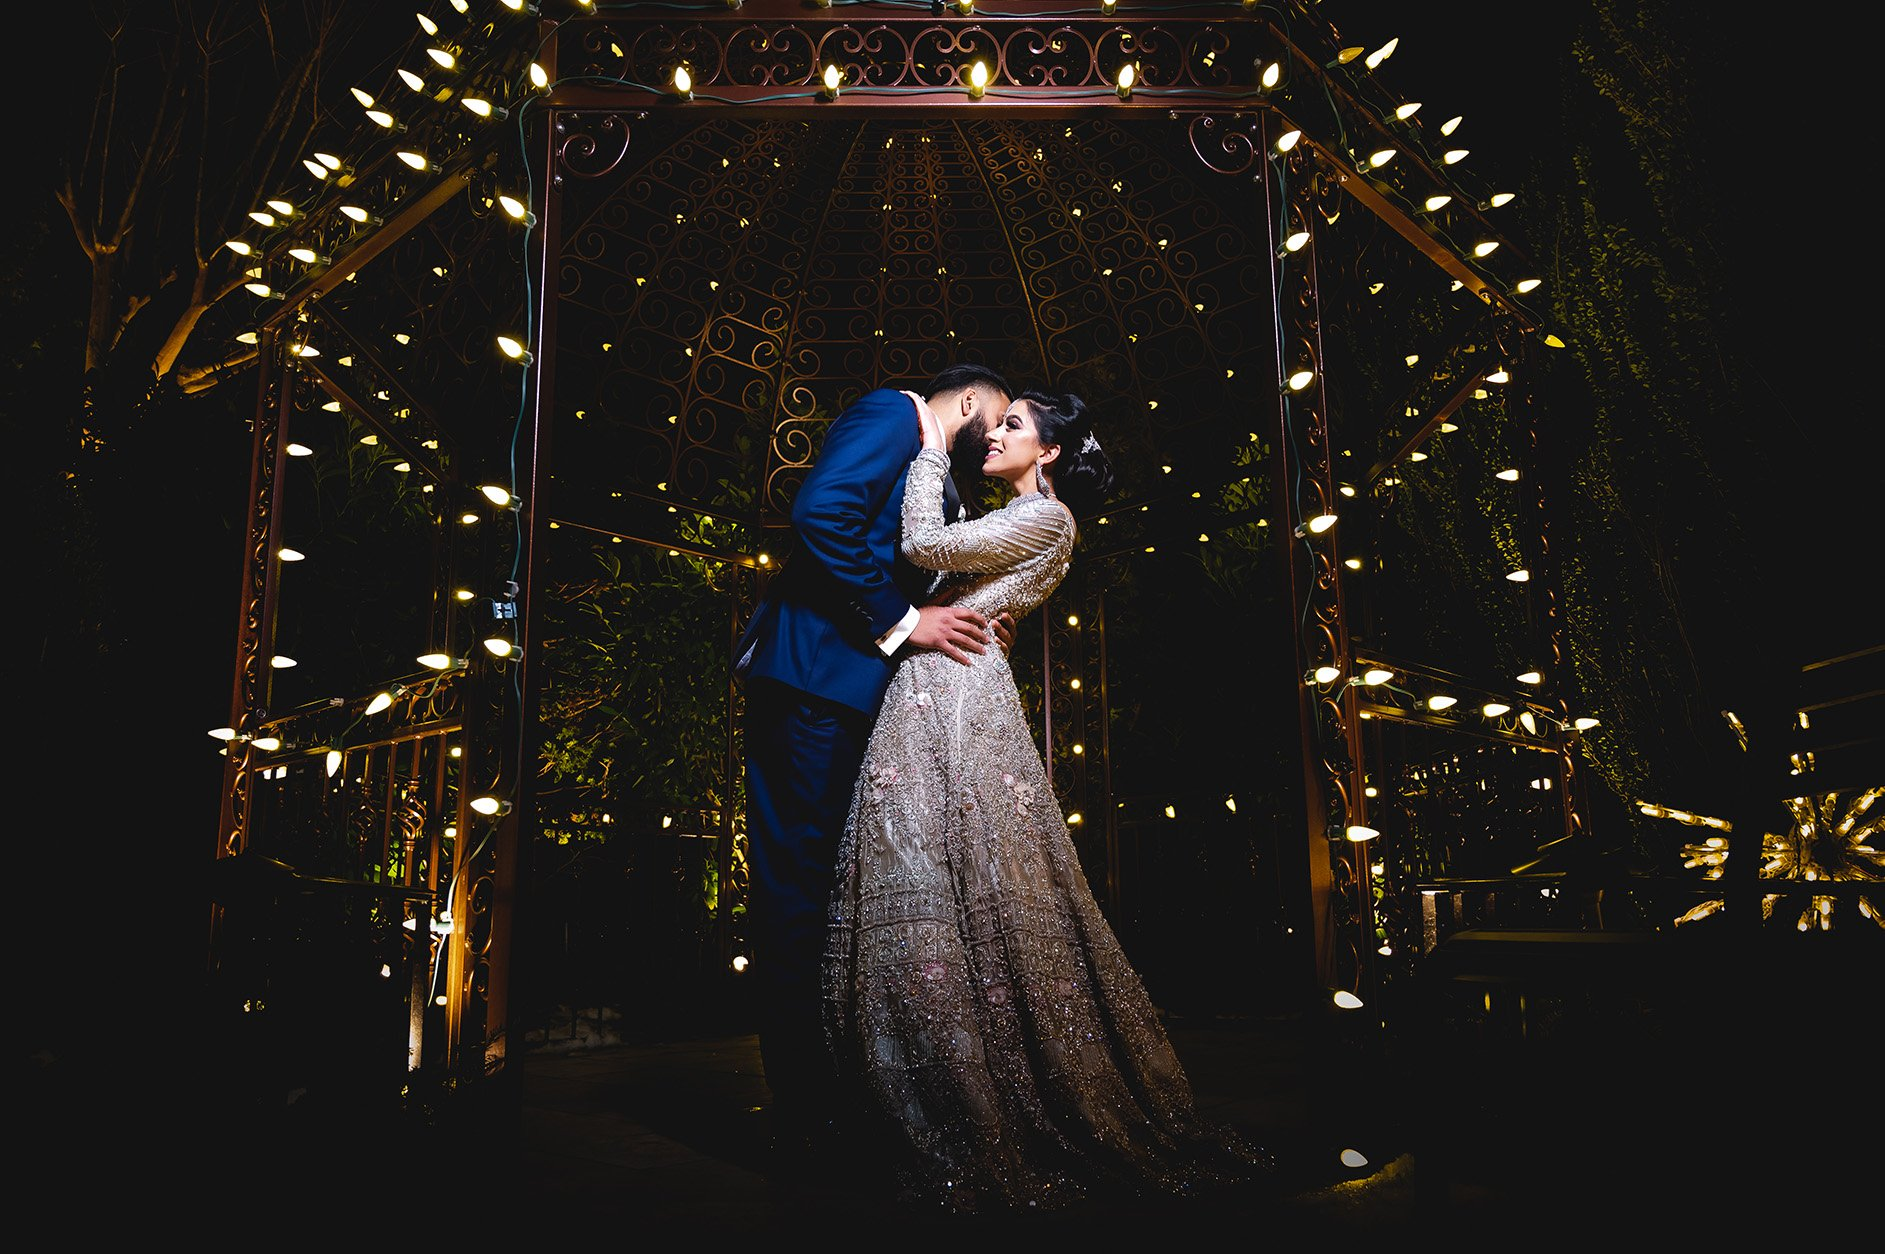 Leonards-Palazzo-Wedding-Photo South Asian Weddings